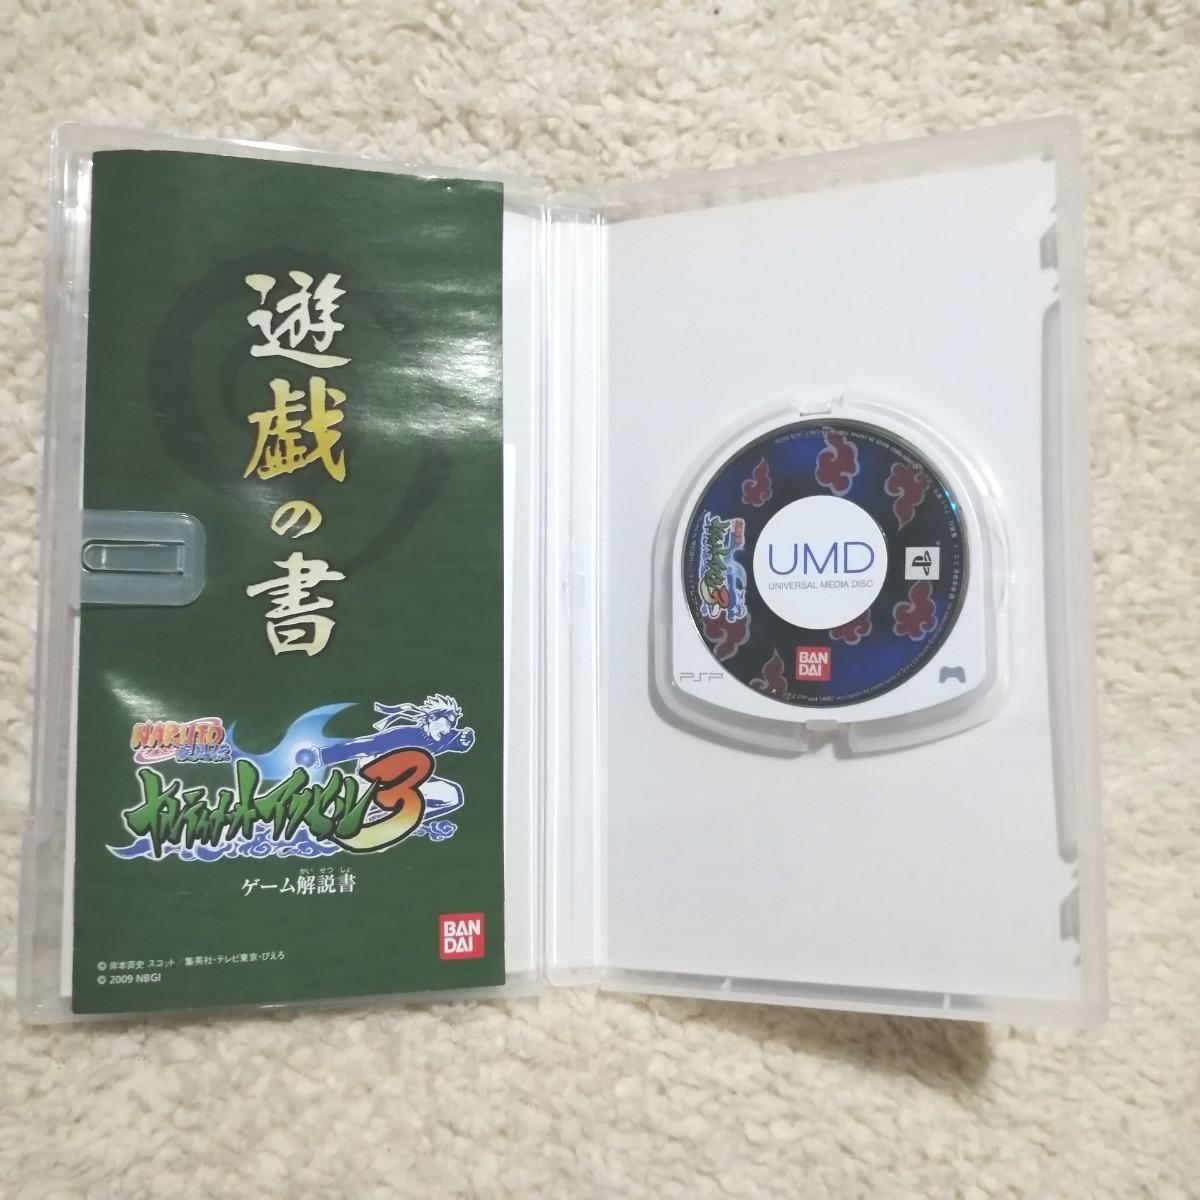 PSPのゲームソフト6本のセット!  PSPソフト